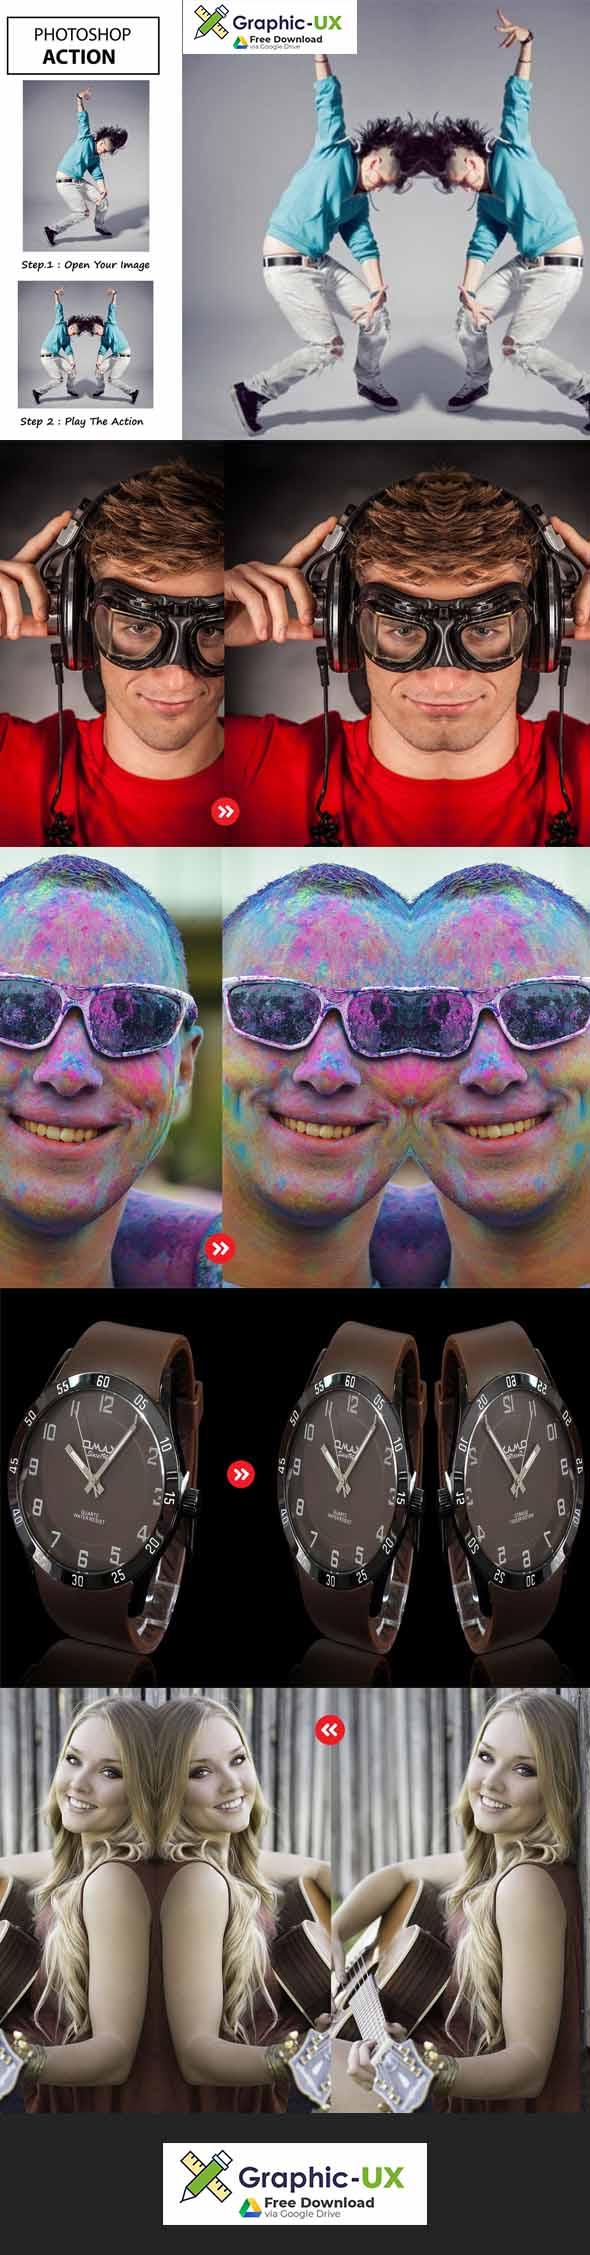 Mirror - Photoshop Action